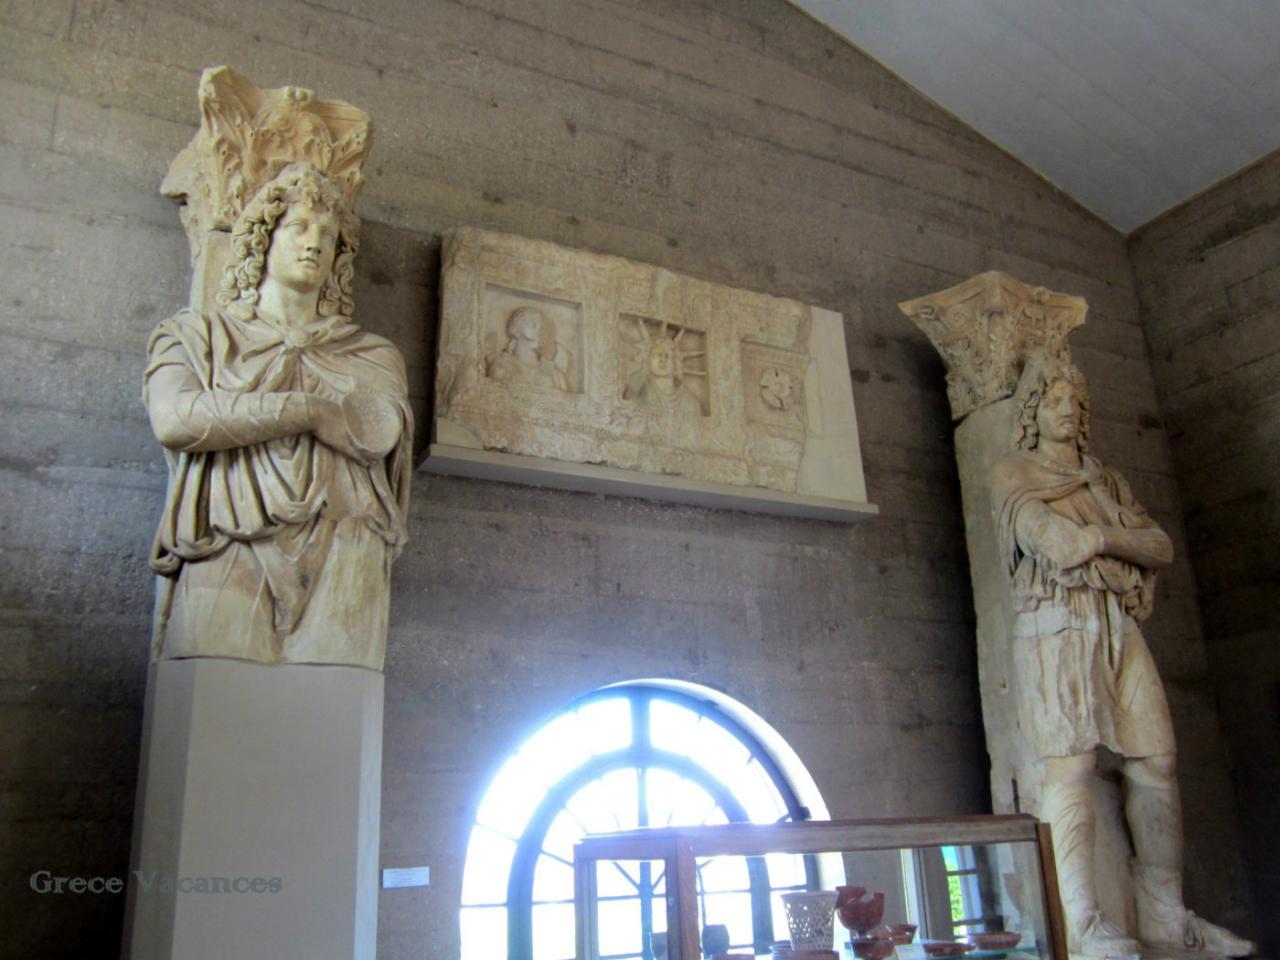 IMG_0039-Ancienne Corinthe - GV-ip